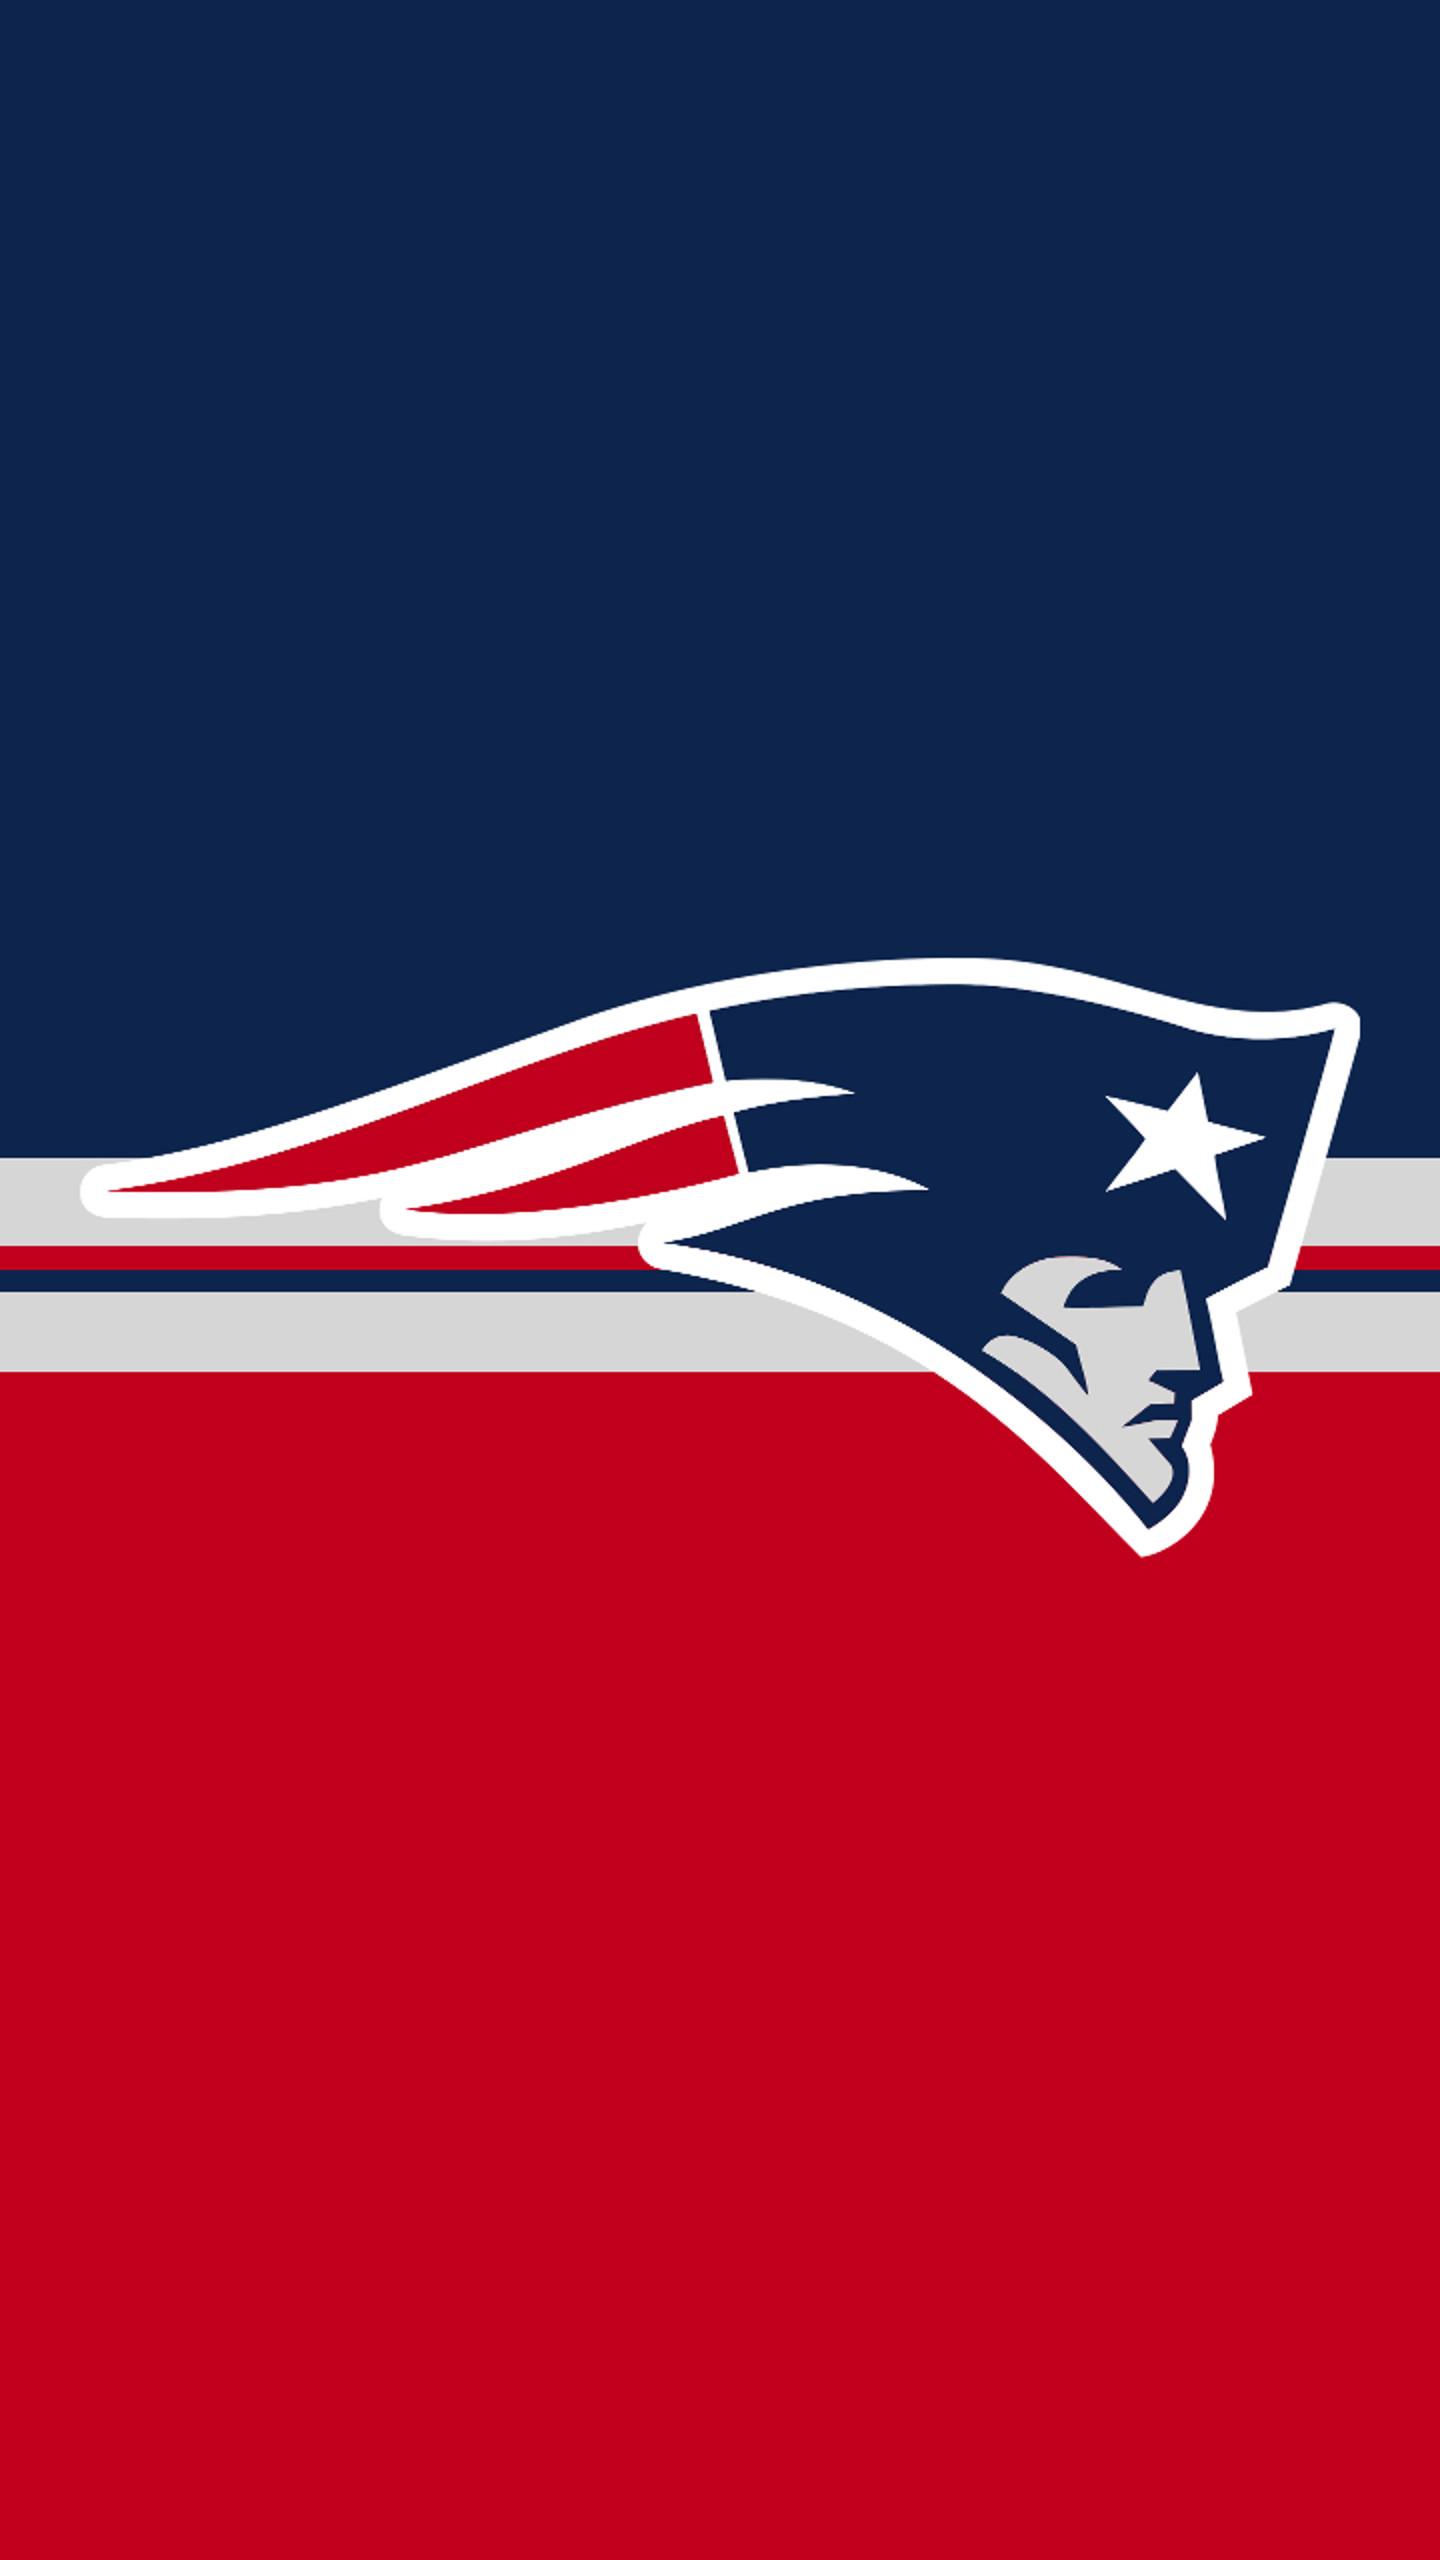 Tom Brady Wallpaper Iphone X Patriots Super Bowl Champions Wallpaper 75 Images